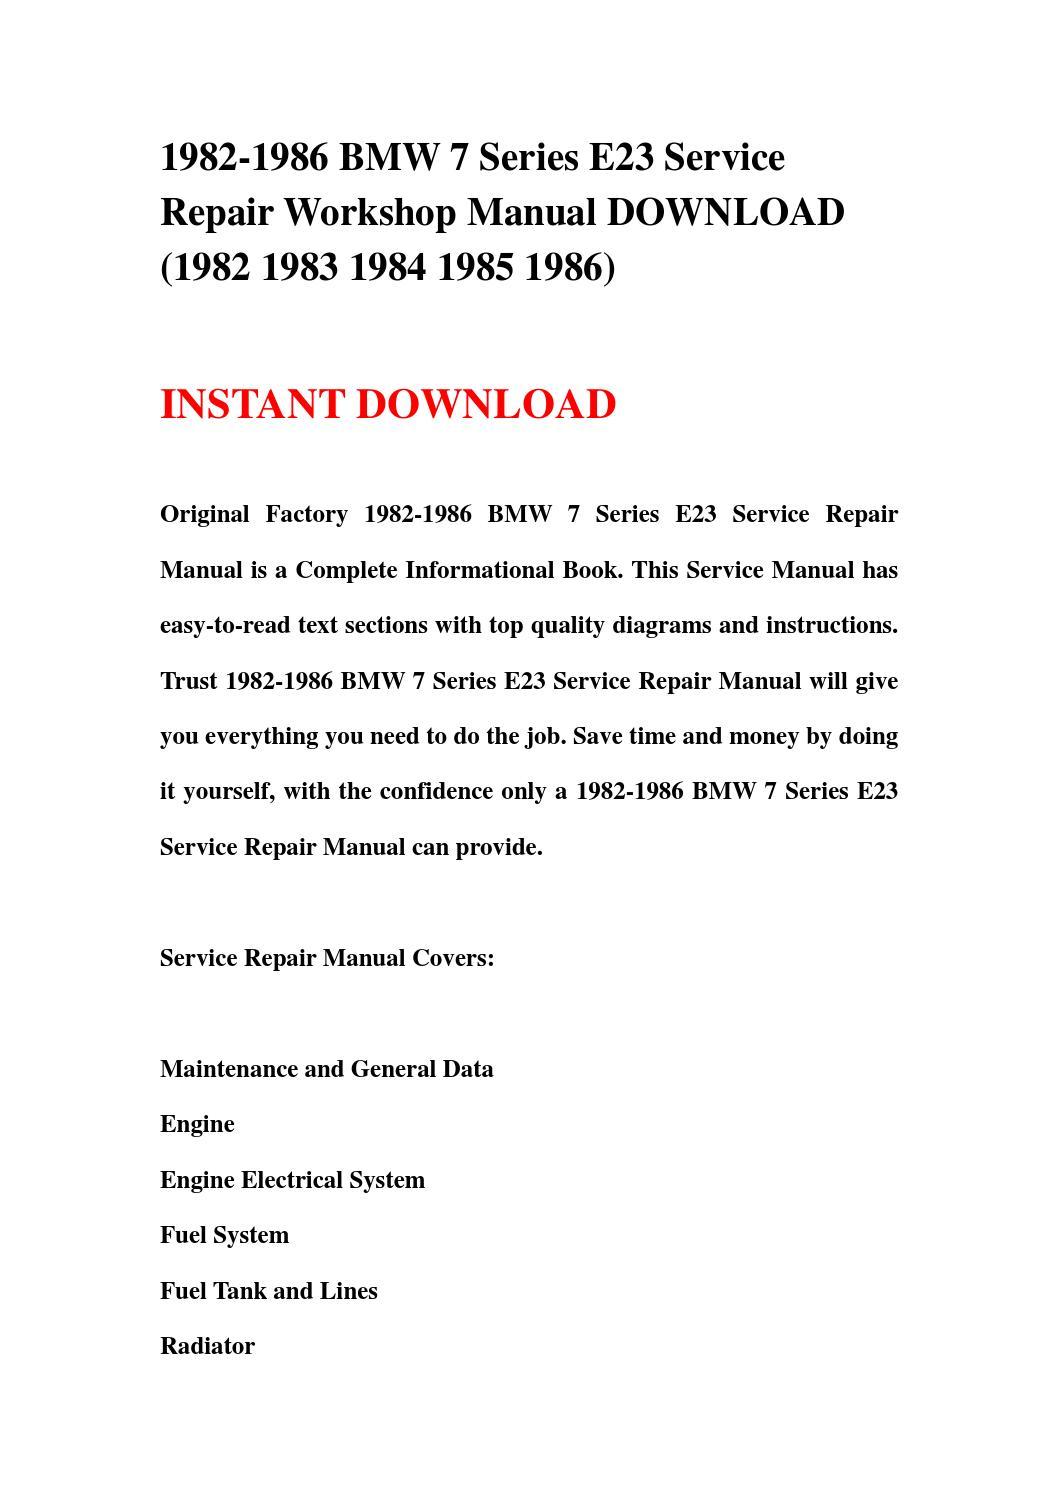 Auto Blog Repair Manual April 2017 19972000 Honda Crv Electrical Troubleshooting Original 1982 1986 Bmw 7 Series E23 Service Workshop Download